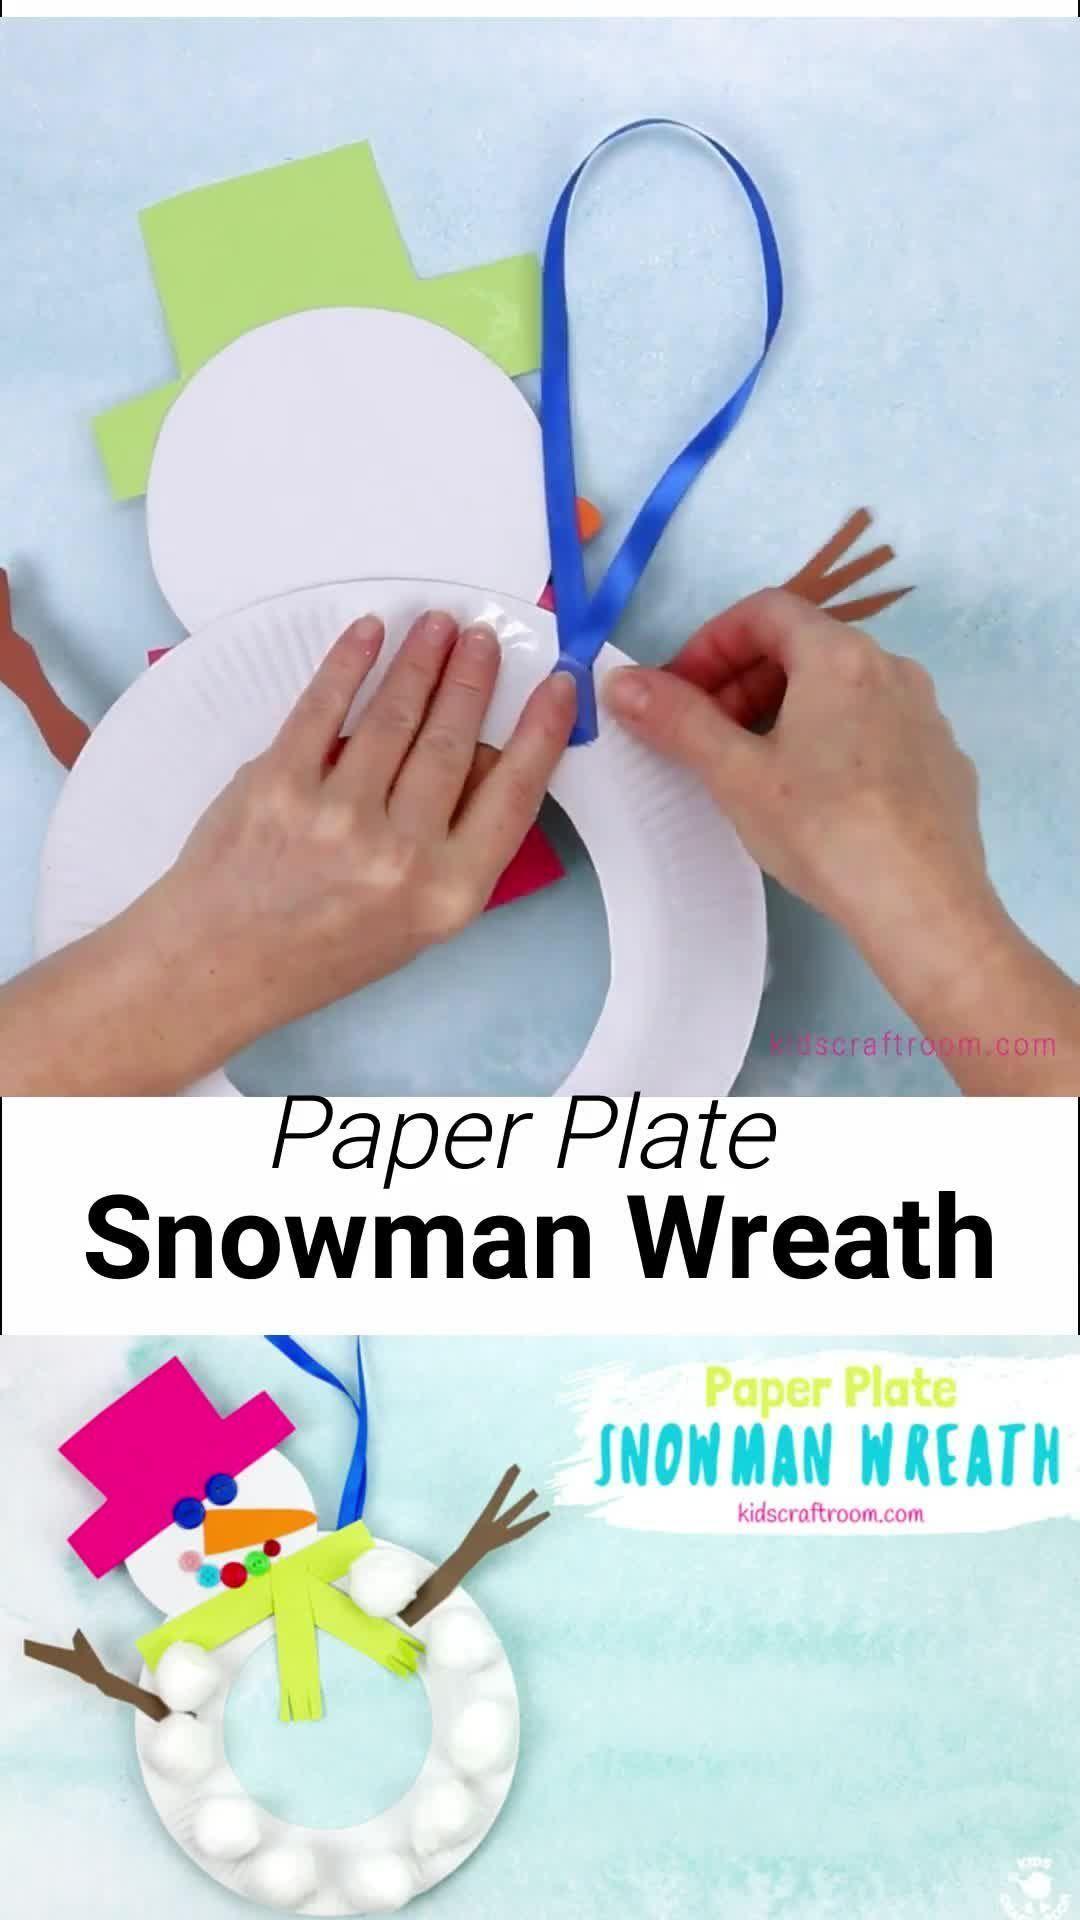 Paper Plate Snowman Wreath -   18 christmas crafts for kids preschool ideas